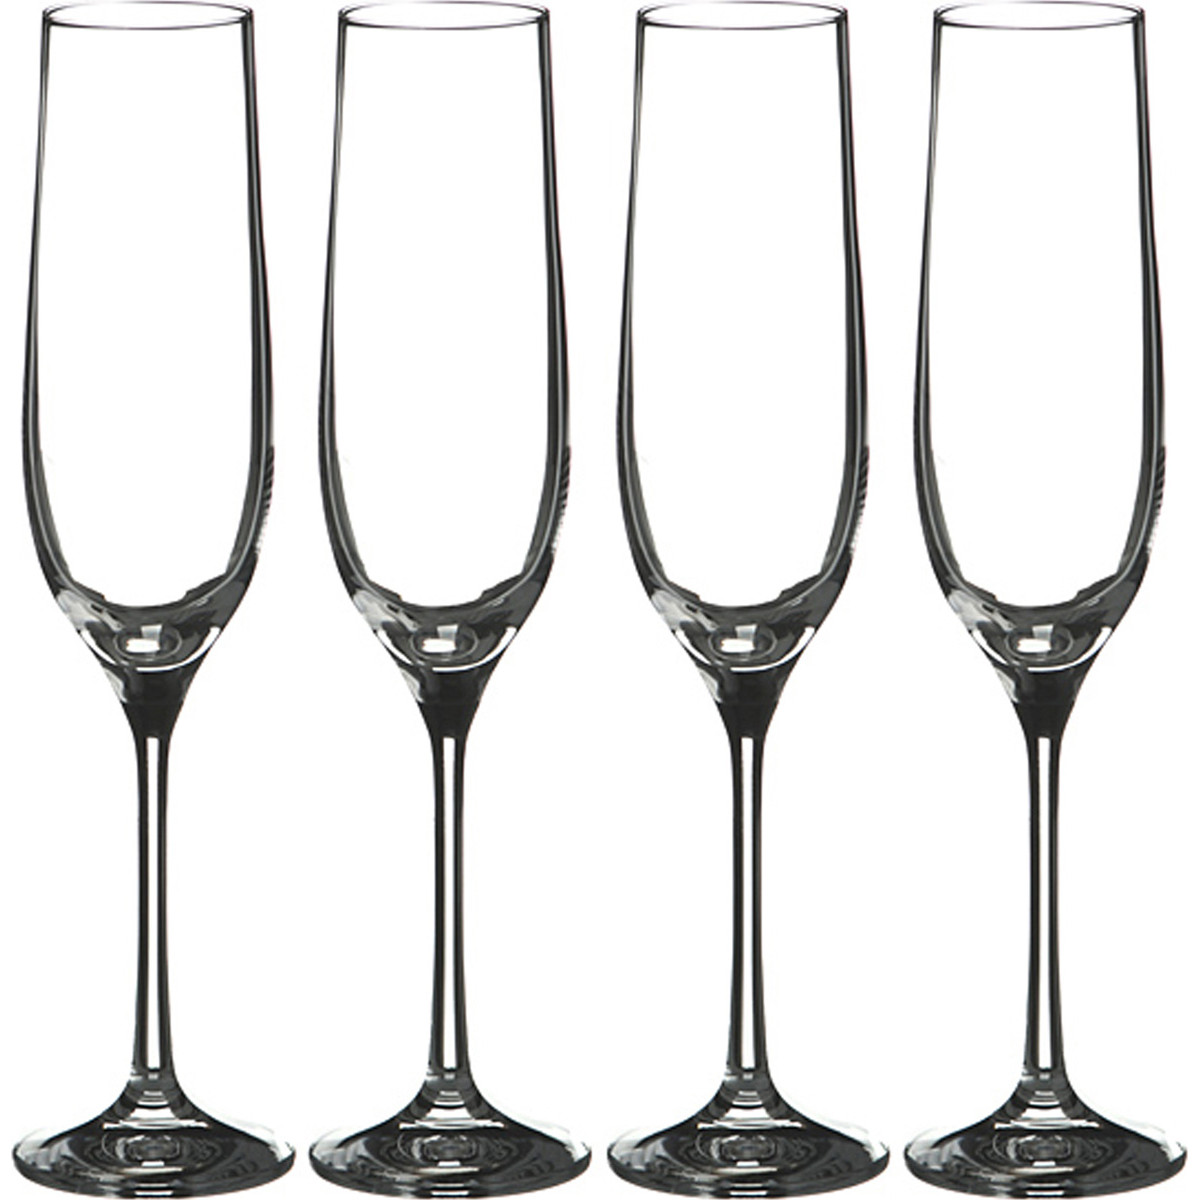 {} Bohemia Crystal Набор бокалов для шампанского Cora  (24 см - 4 шт) crystal bohemia